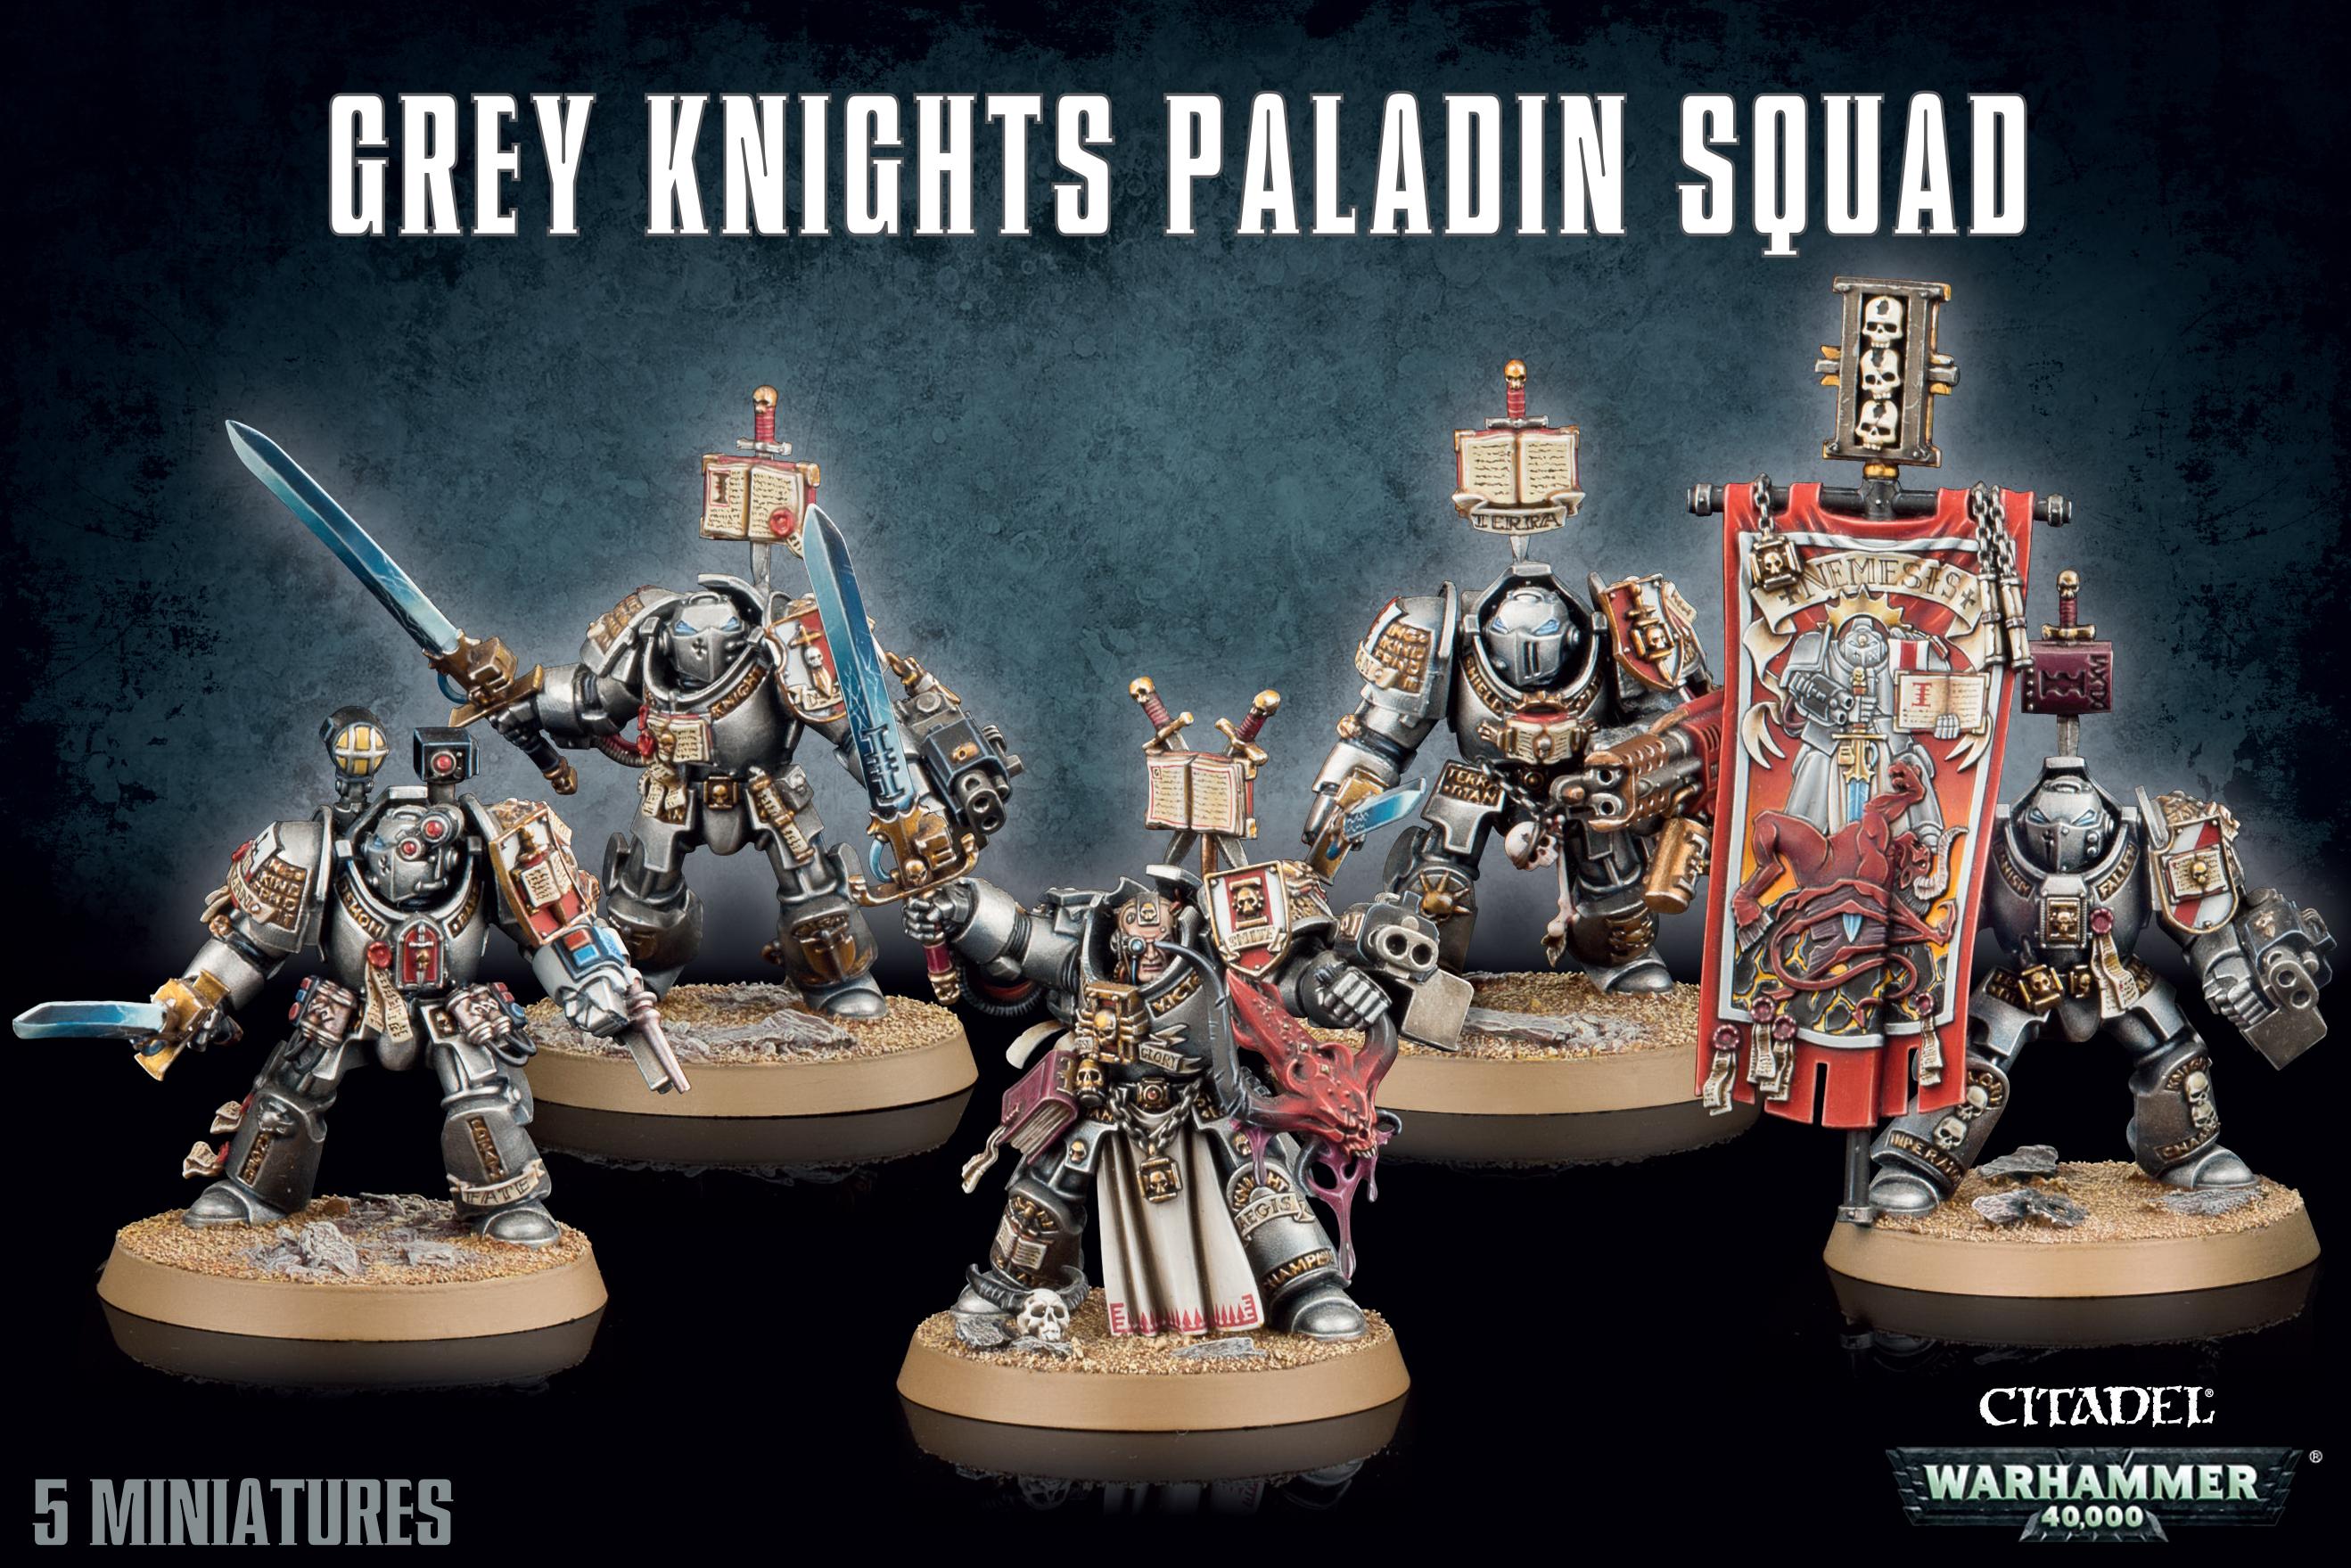 Grey Knights Paladin Squad, Imperials